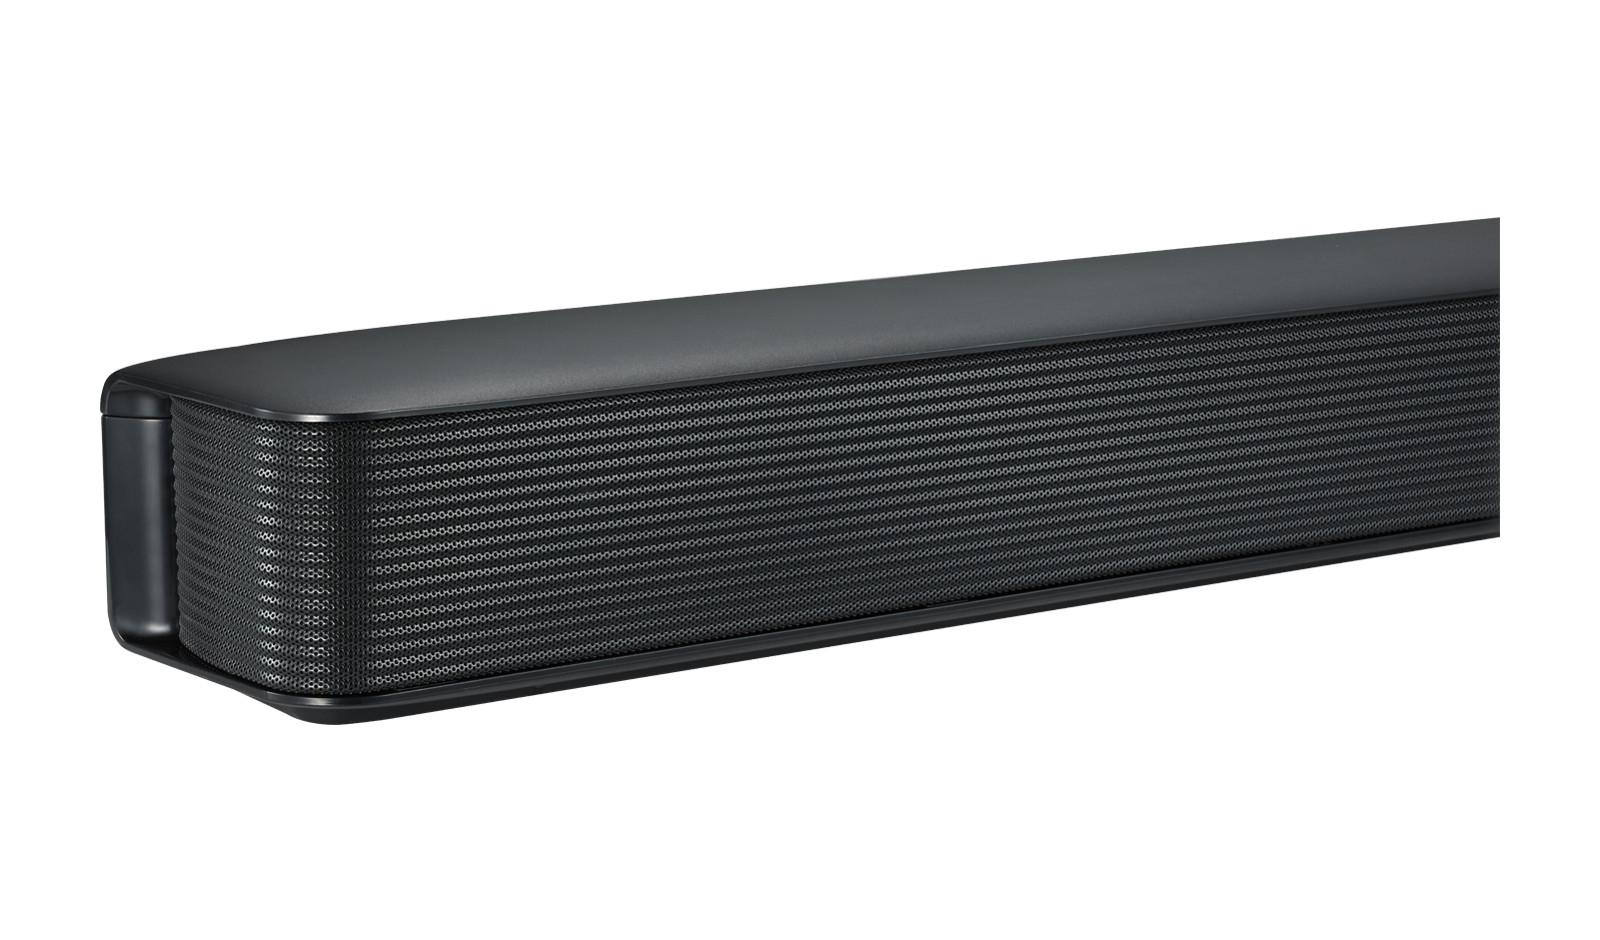 SK1 Barre de son - Bluetooth - 40 W - Entree jack - Noir